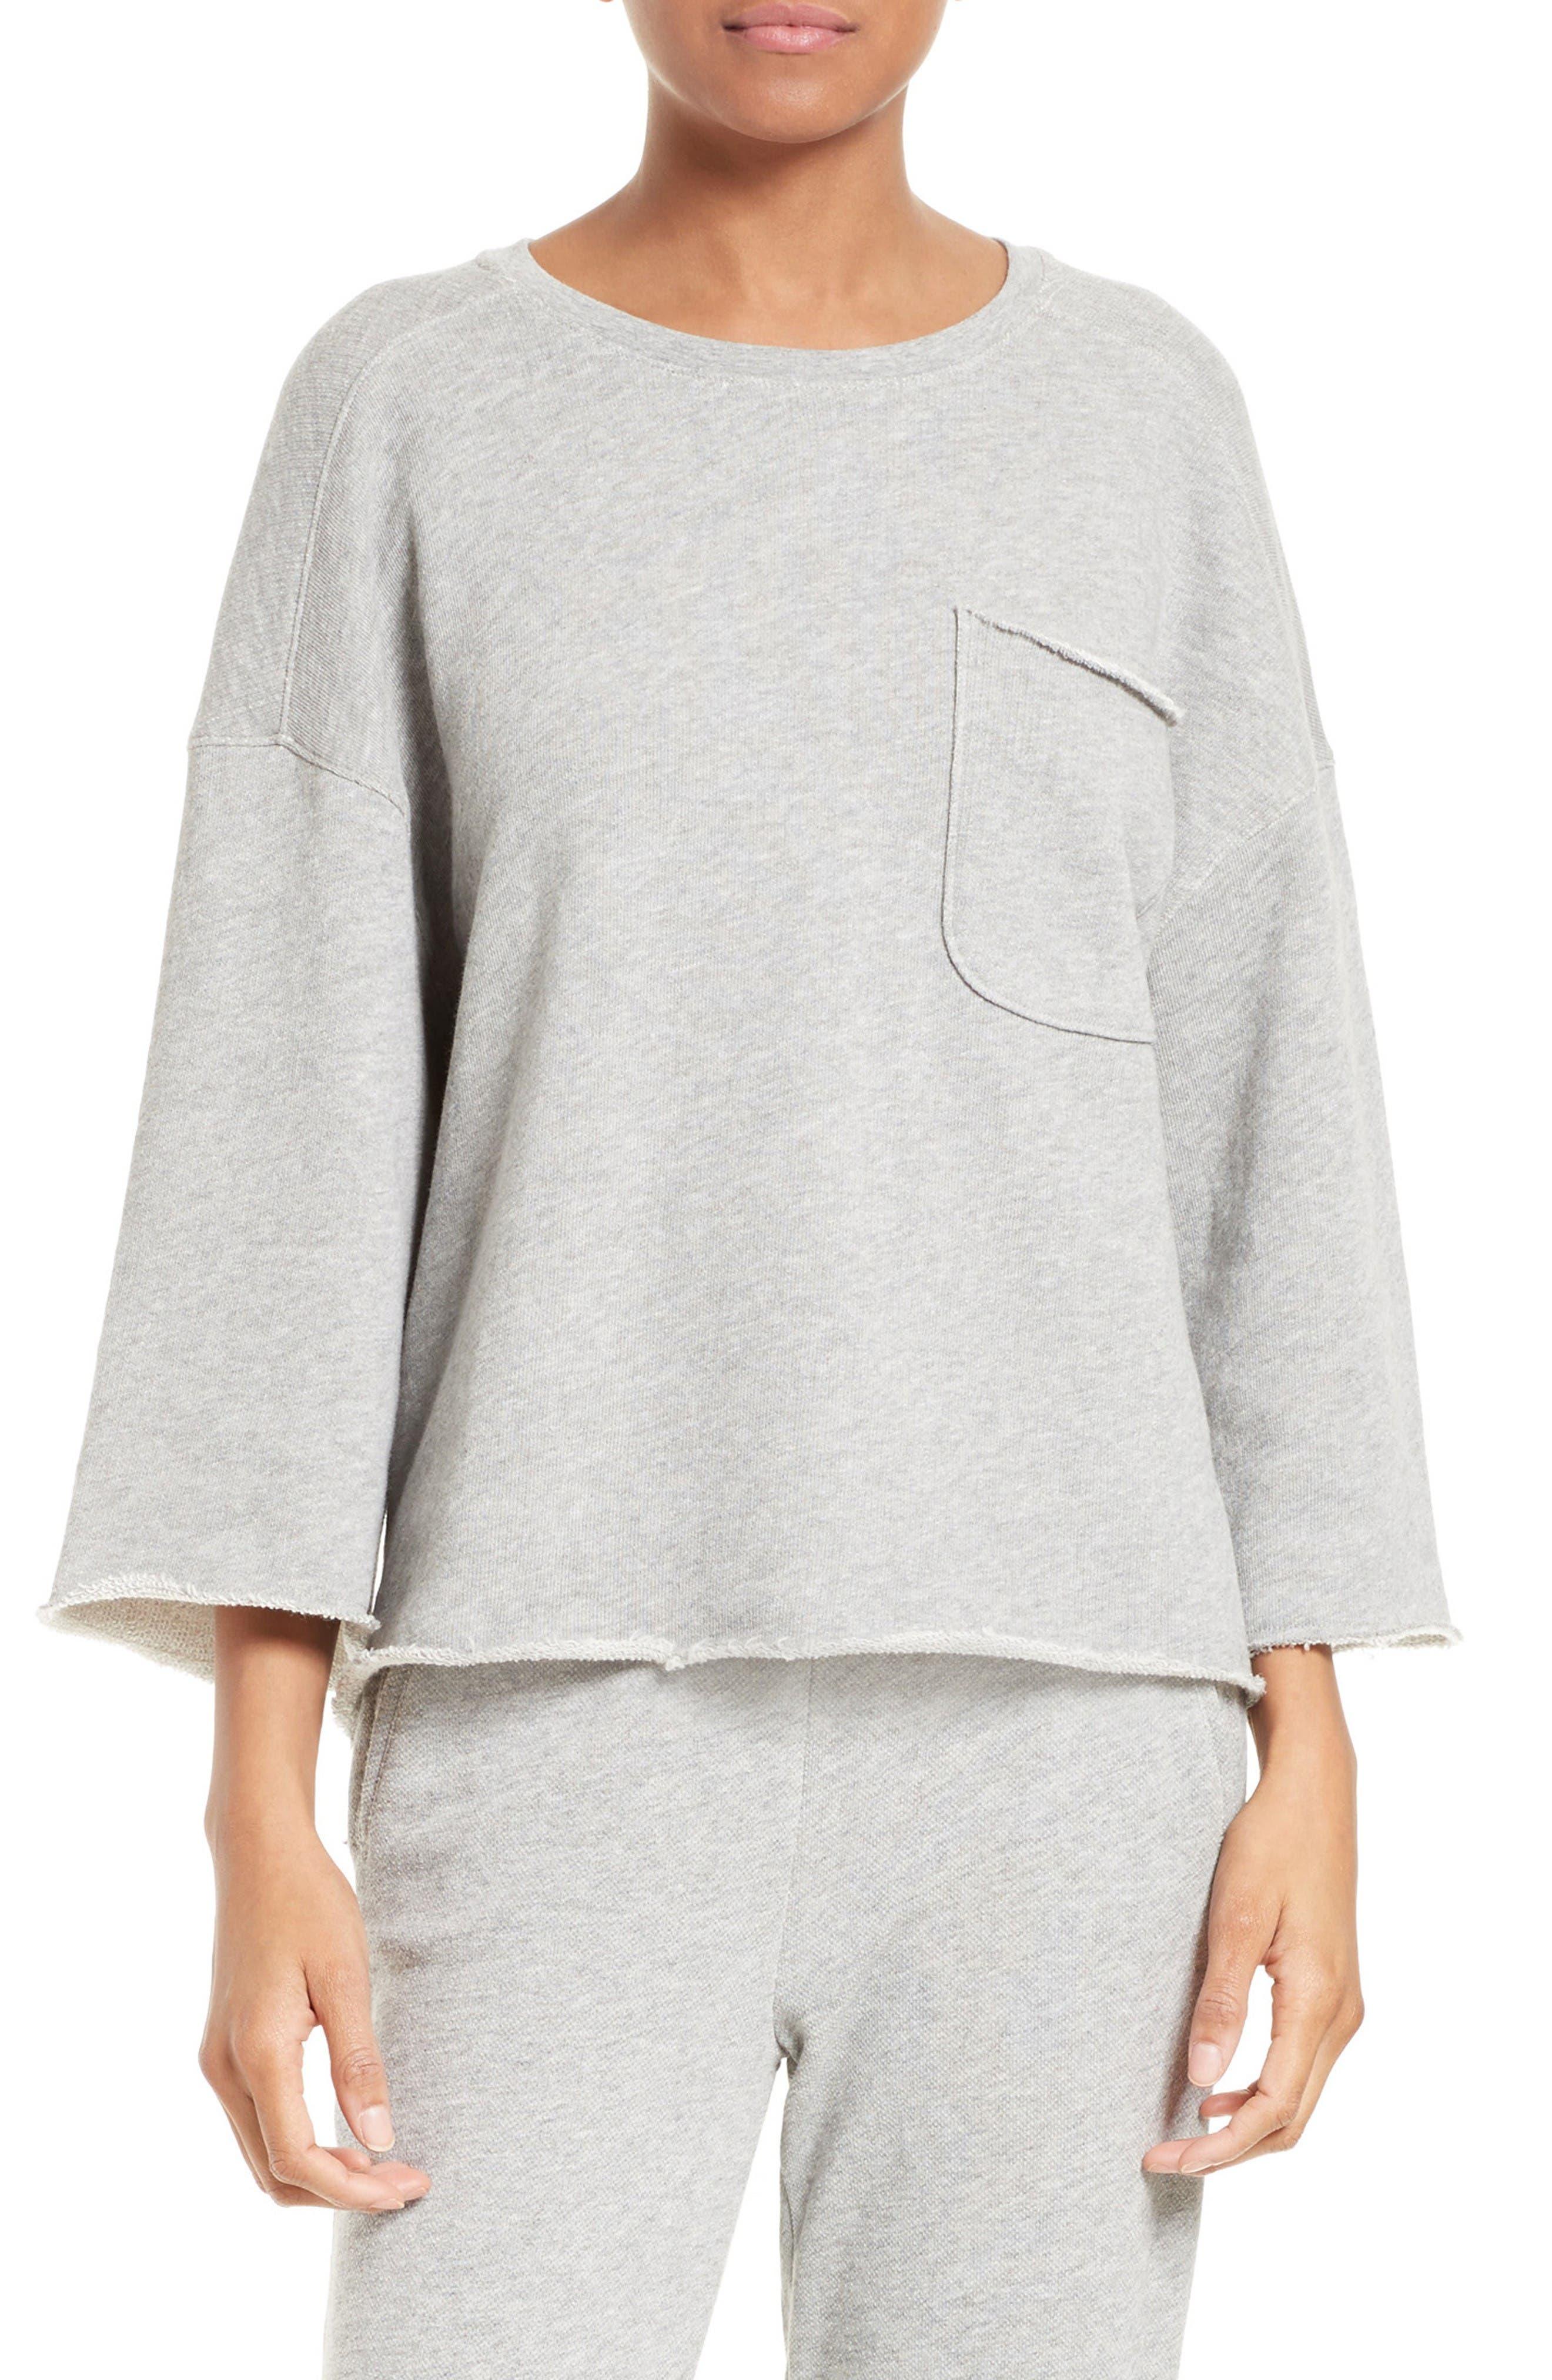 ATM Anthony Thomas Melillo Pocket Sweatshirt